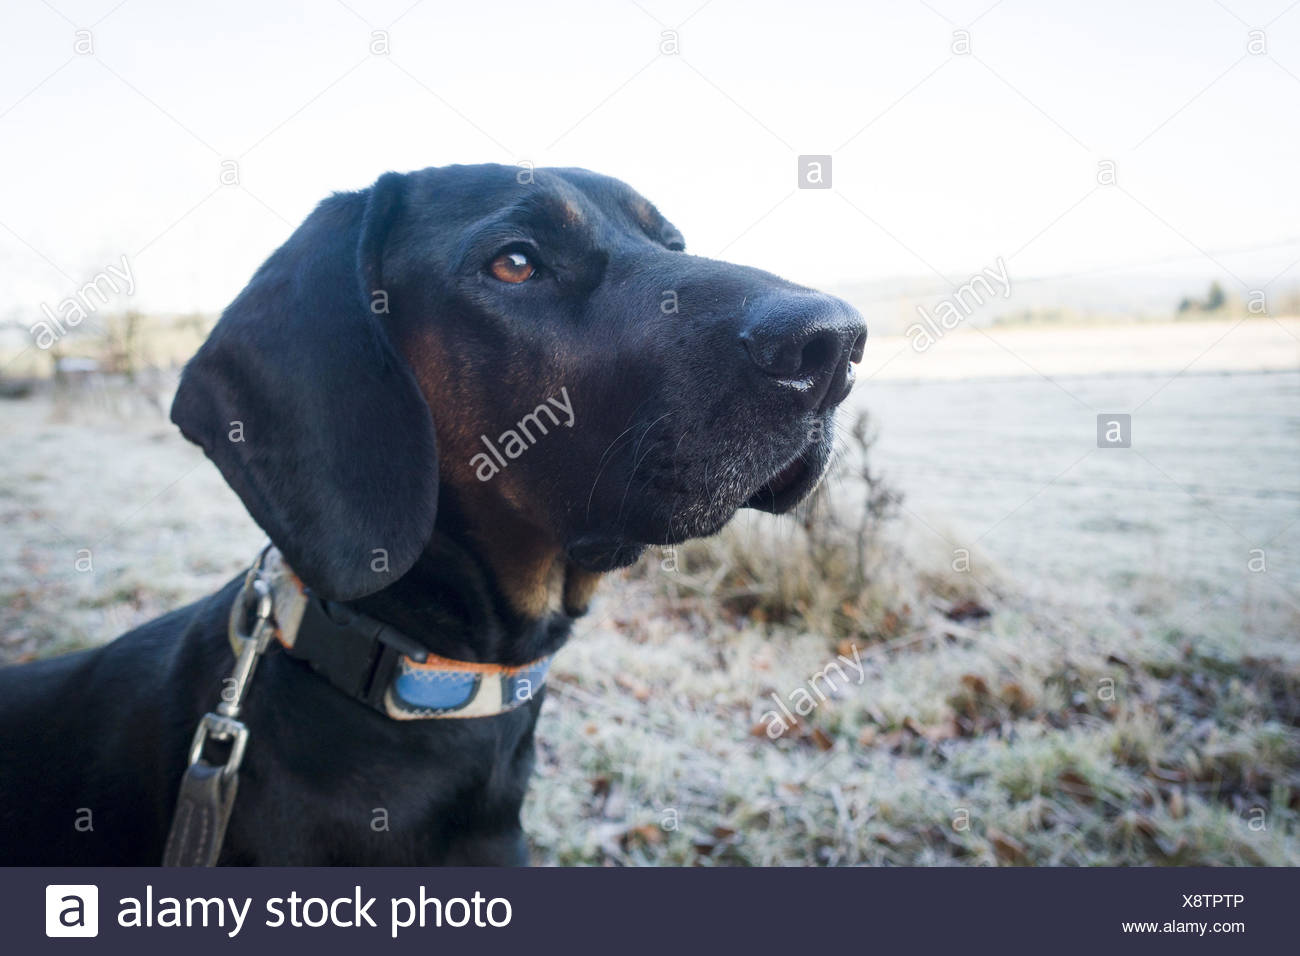 Polish Hound, black hunting hound, portrait - Stock Image